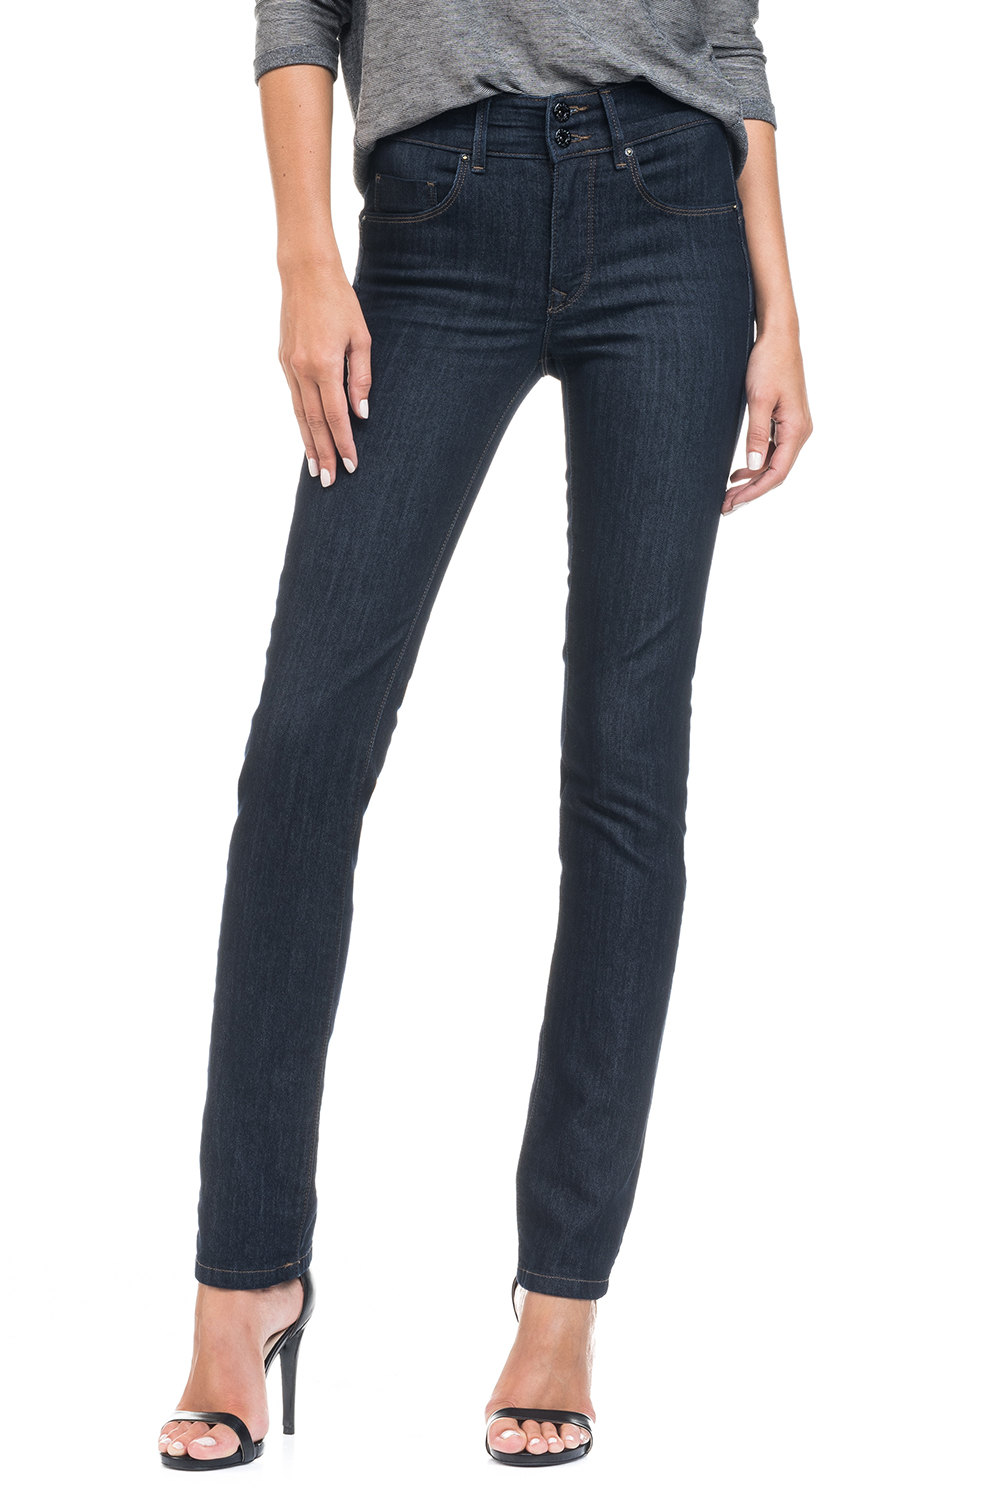 SALSA| Push In Secret Slim Jeans | Dark Rinse